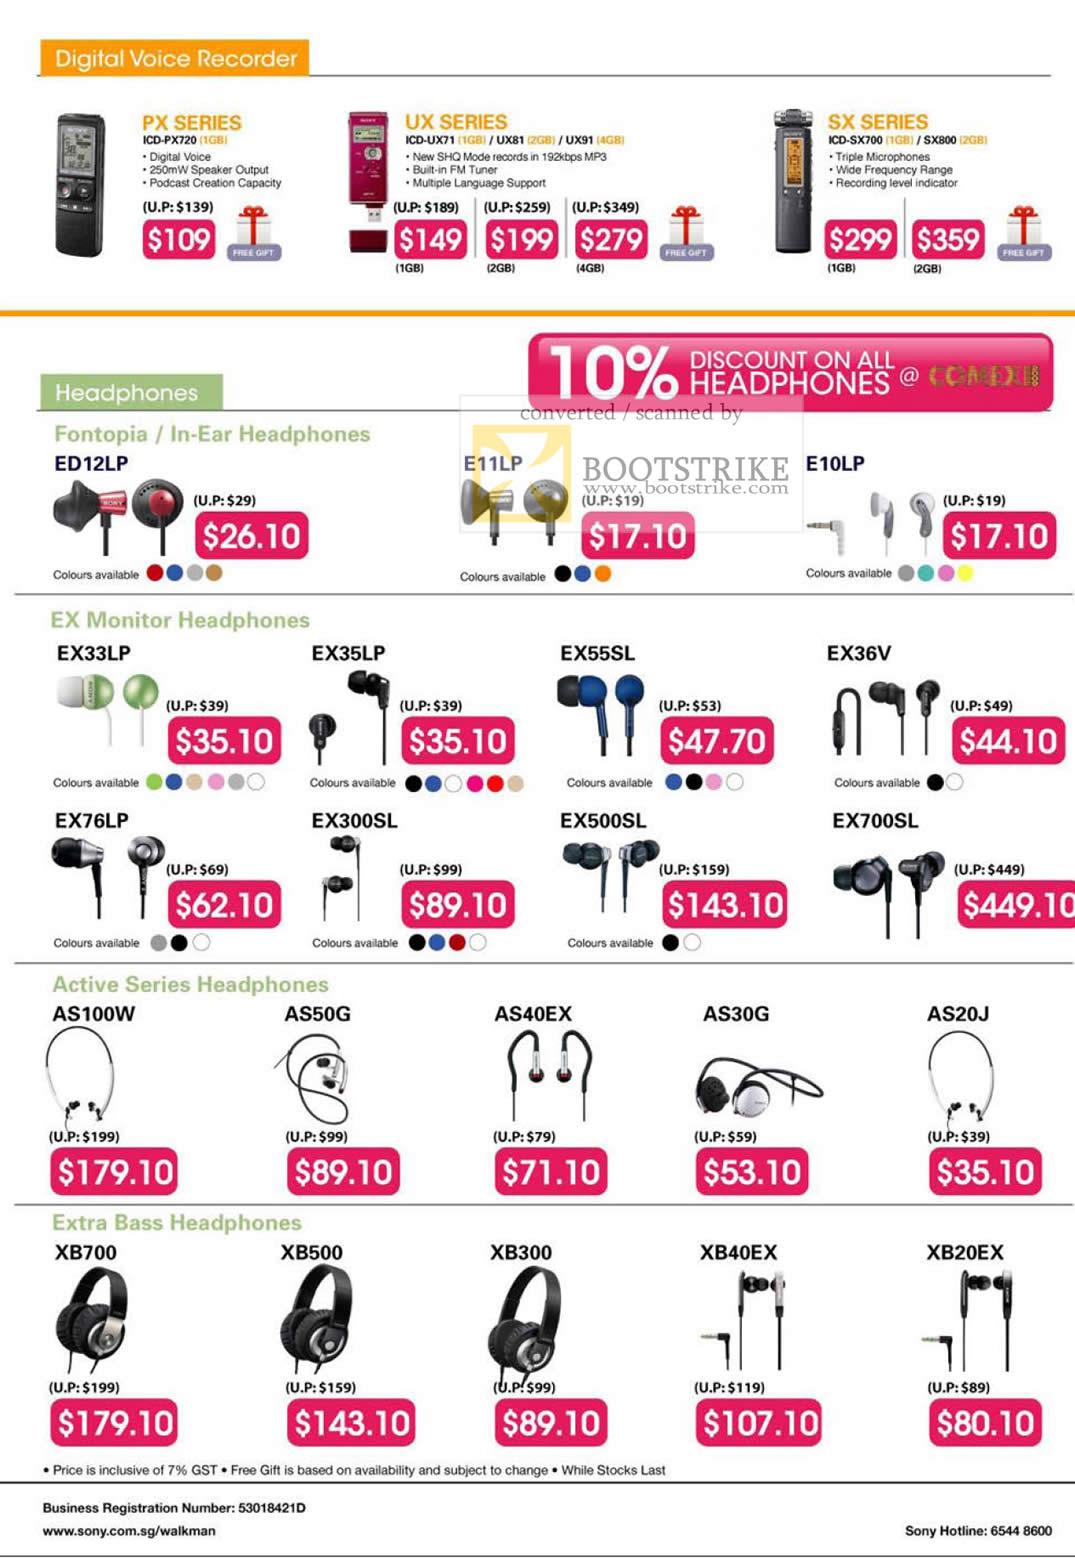 Comex 2009 price list image brochure of Sony Digital Voice Recorder PX UX SX Headphones Fontopia EX Monitor Active Series